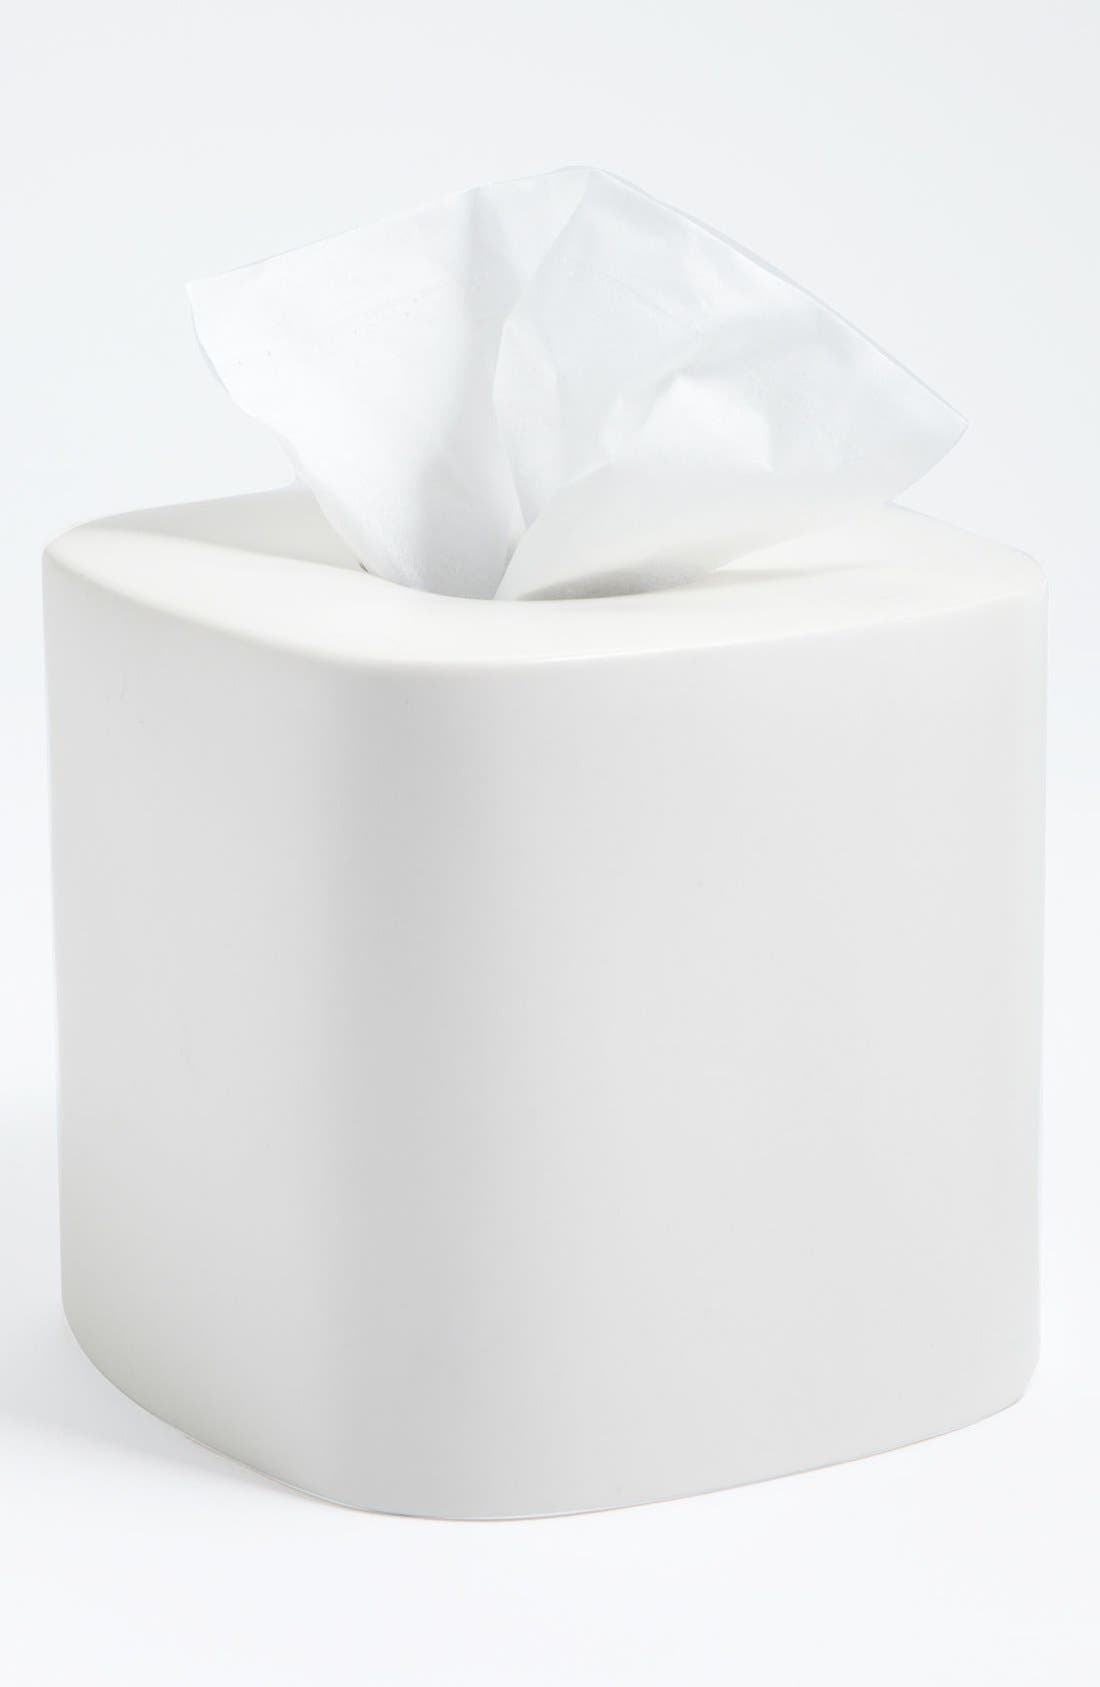 Alternate Image 1 Selected - Waterworks Studio 'Modern' Ceramic Tissue Cover (Online Only)